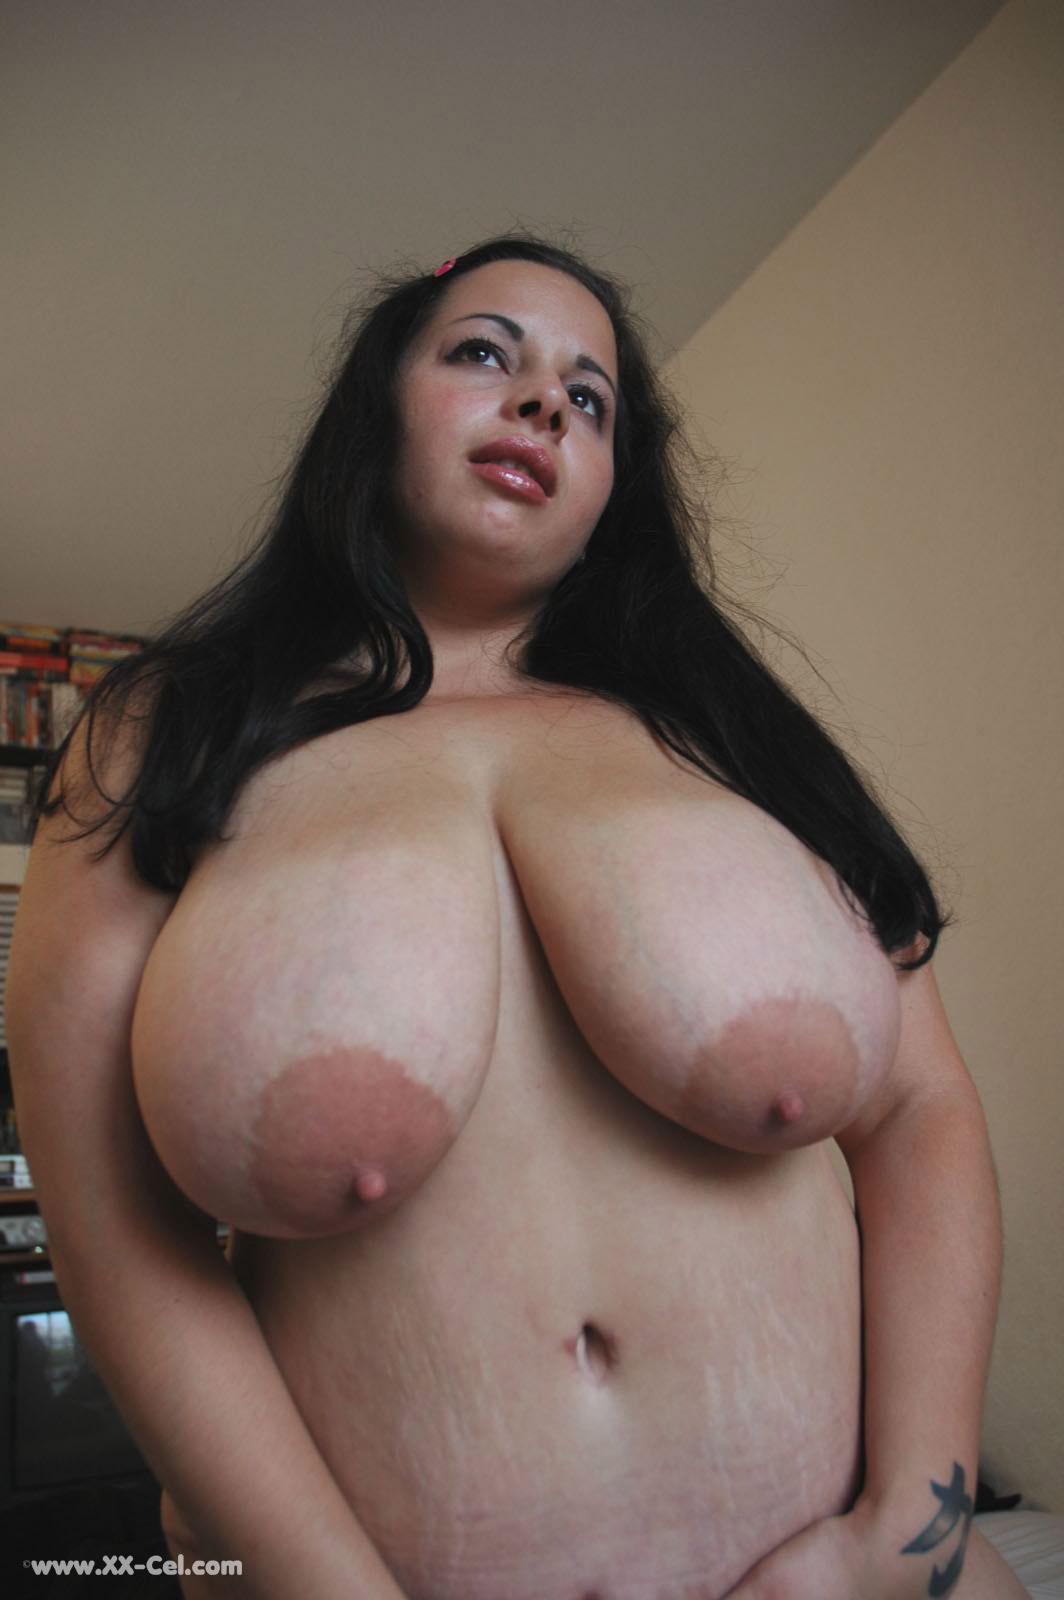 9-porno.ru Фото голых огромных сисек